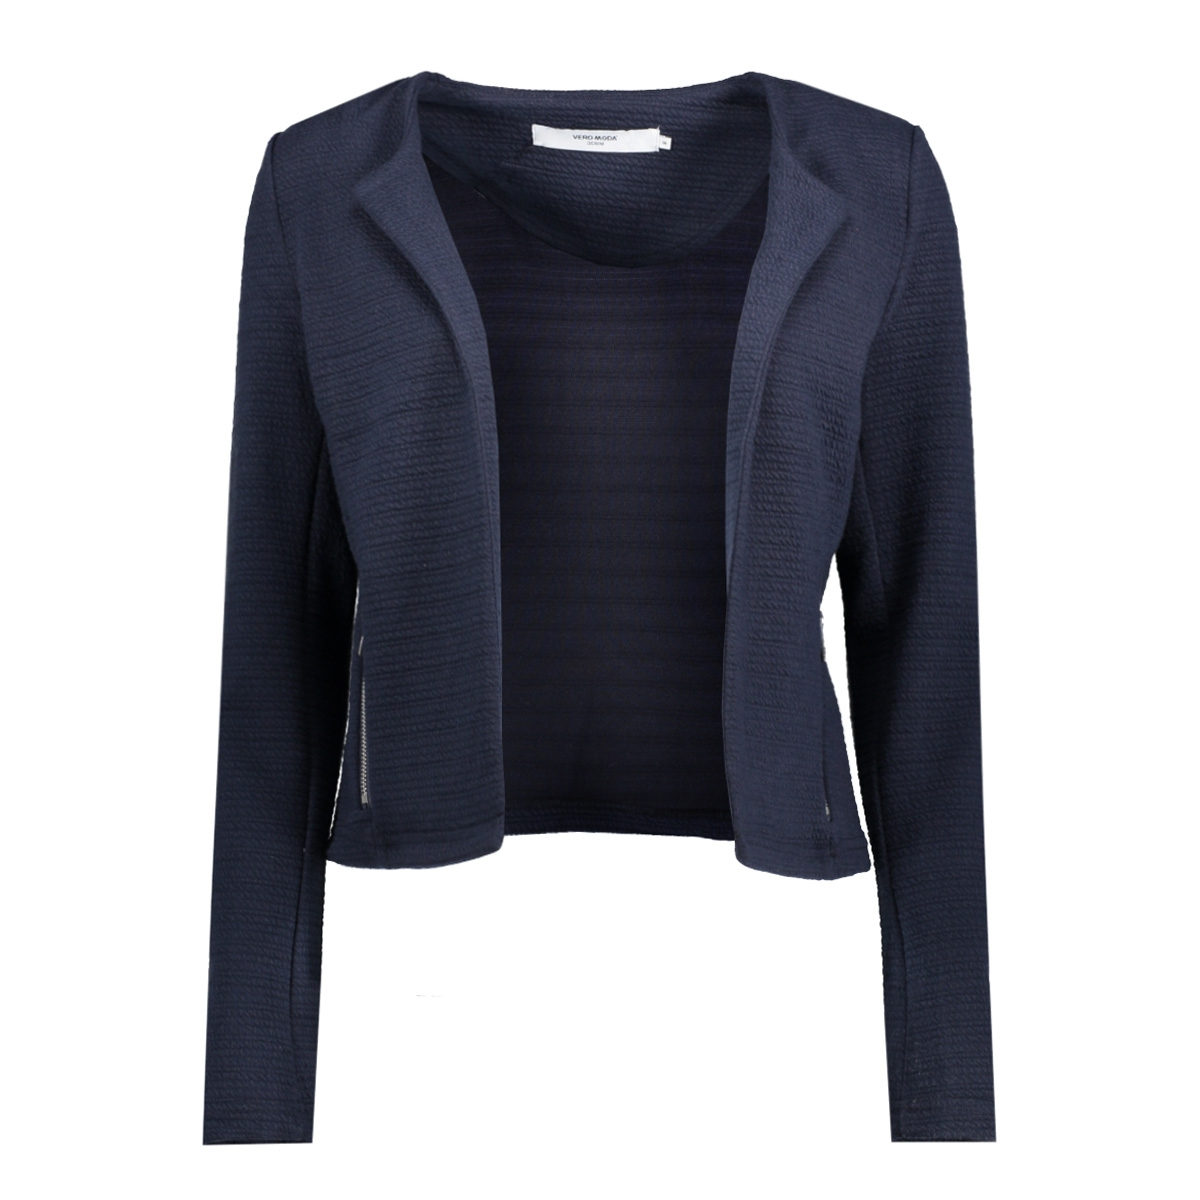 vmstruc-navy3 blazer dnm 10178204 vero moda blazer navy blazer/silver zip